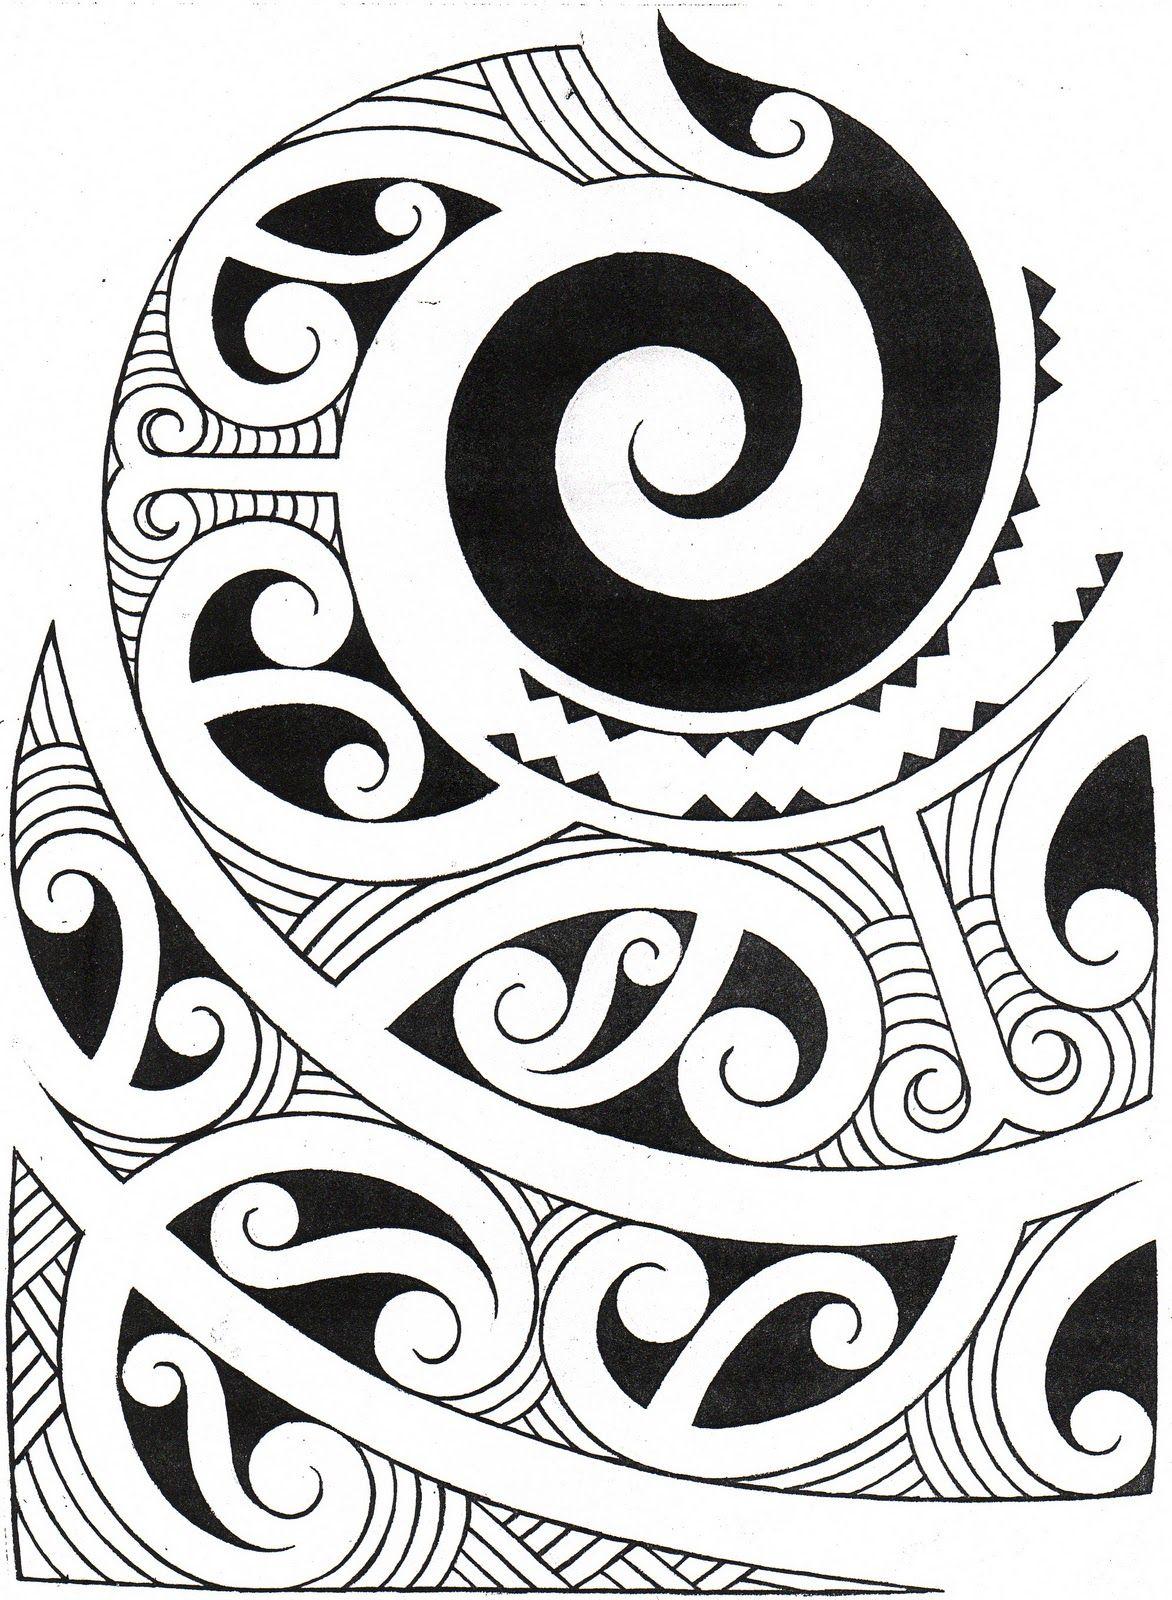 Maori Tattoo Meanings And Symbols: Maori Art, Maori Patterns